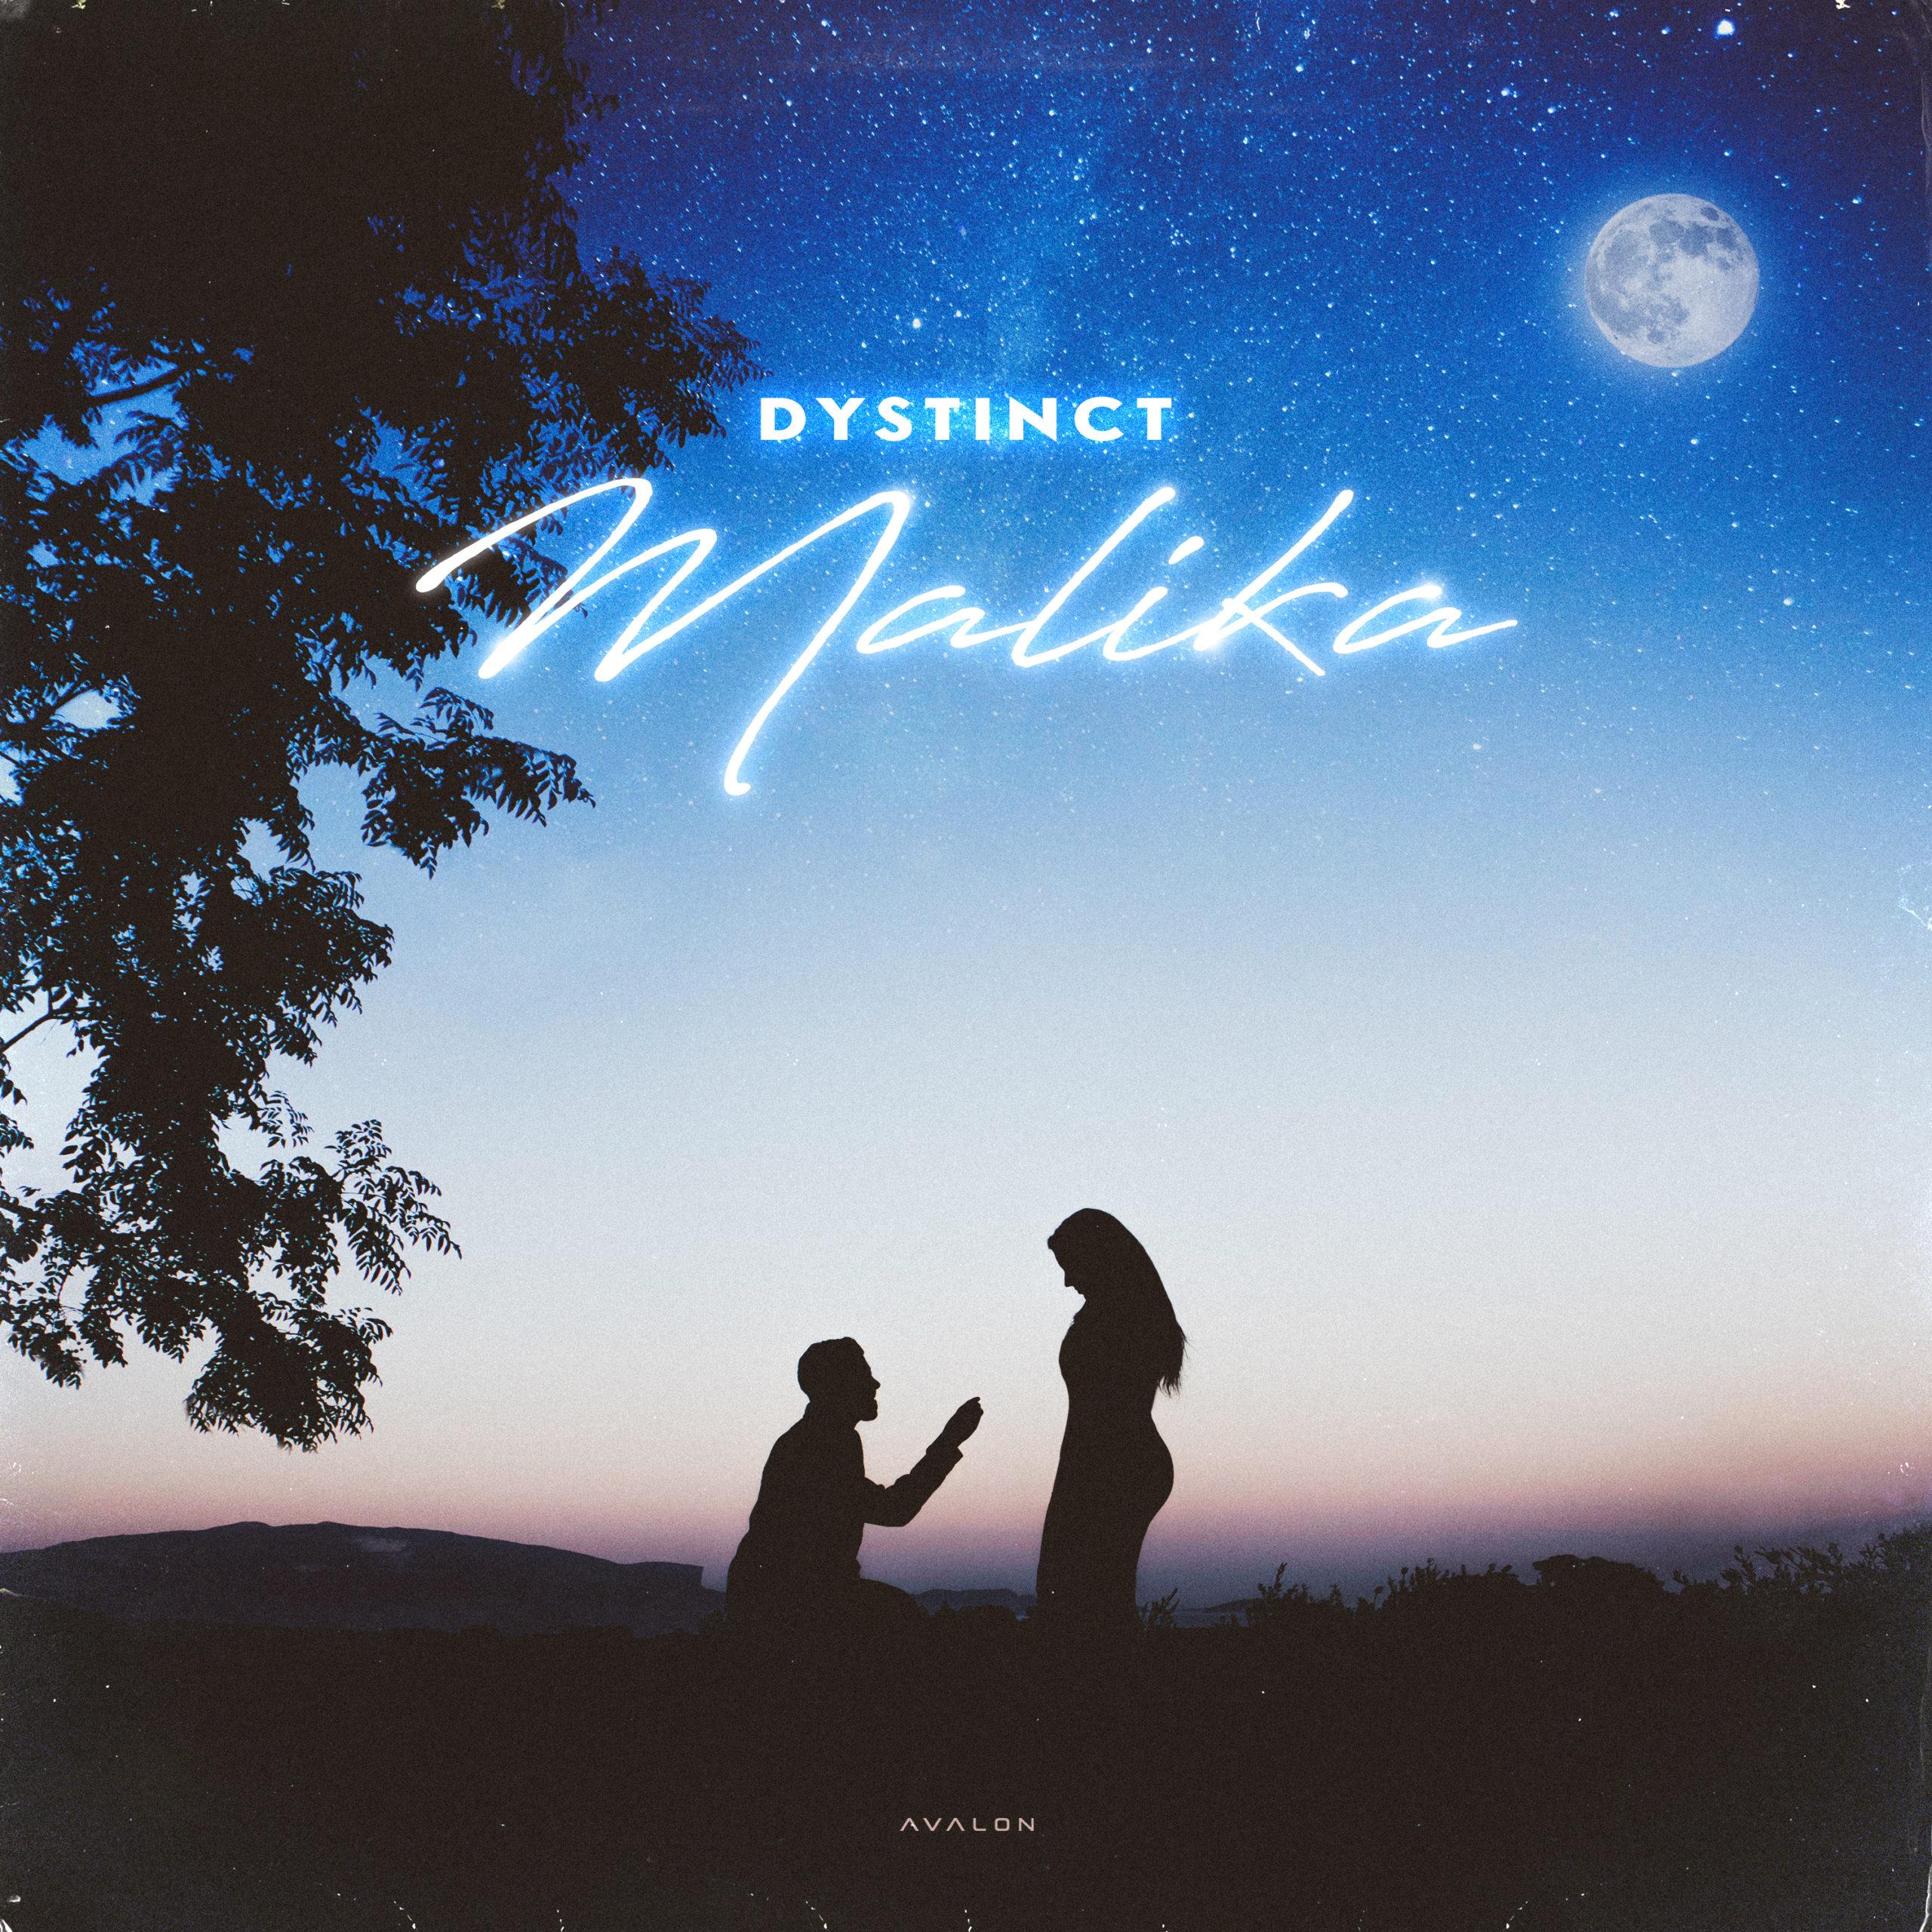 [OUT NOW] DYSTINCT – Malika / ديستينكت – مليكة